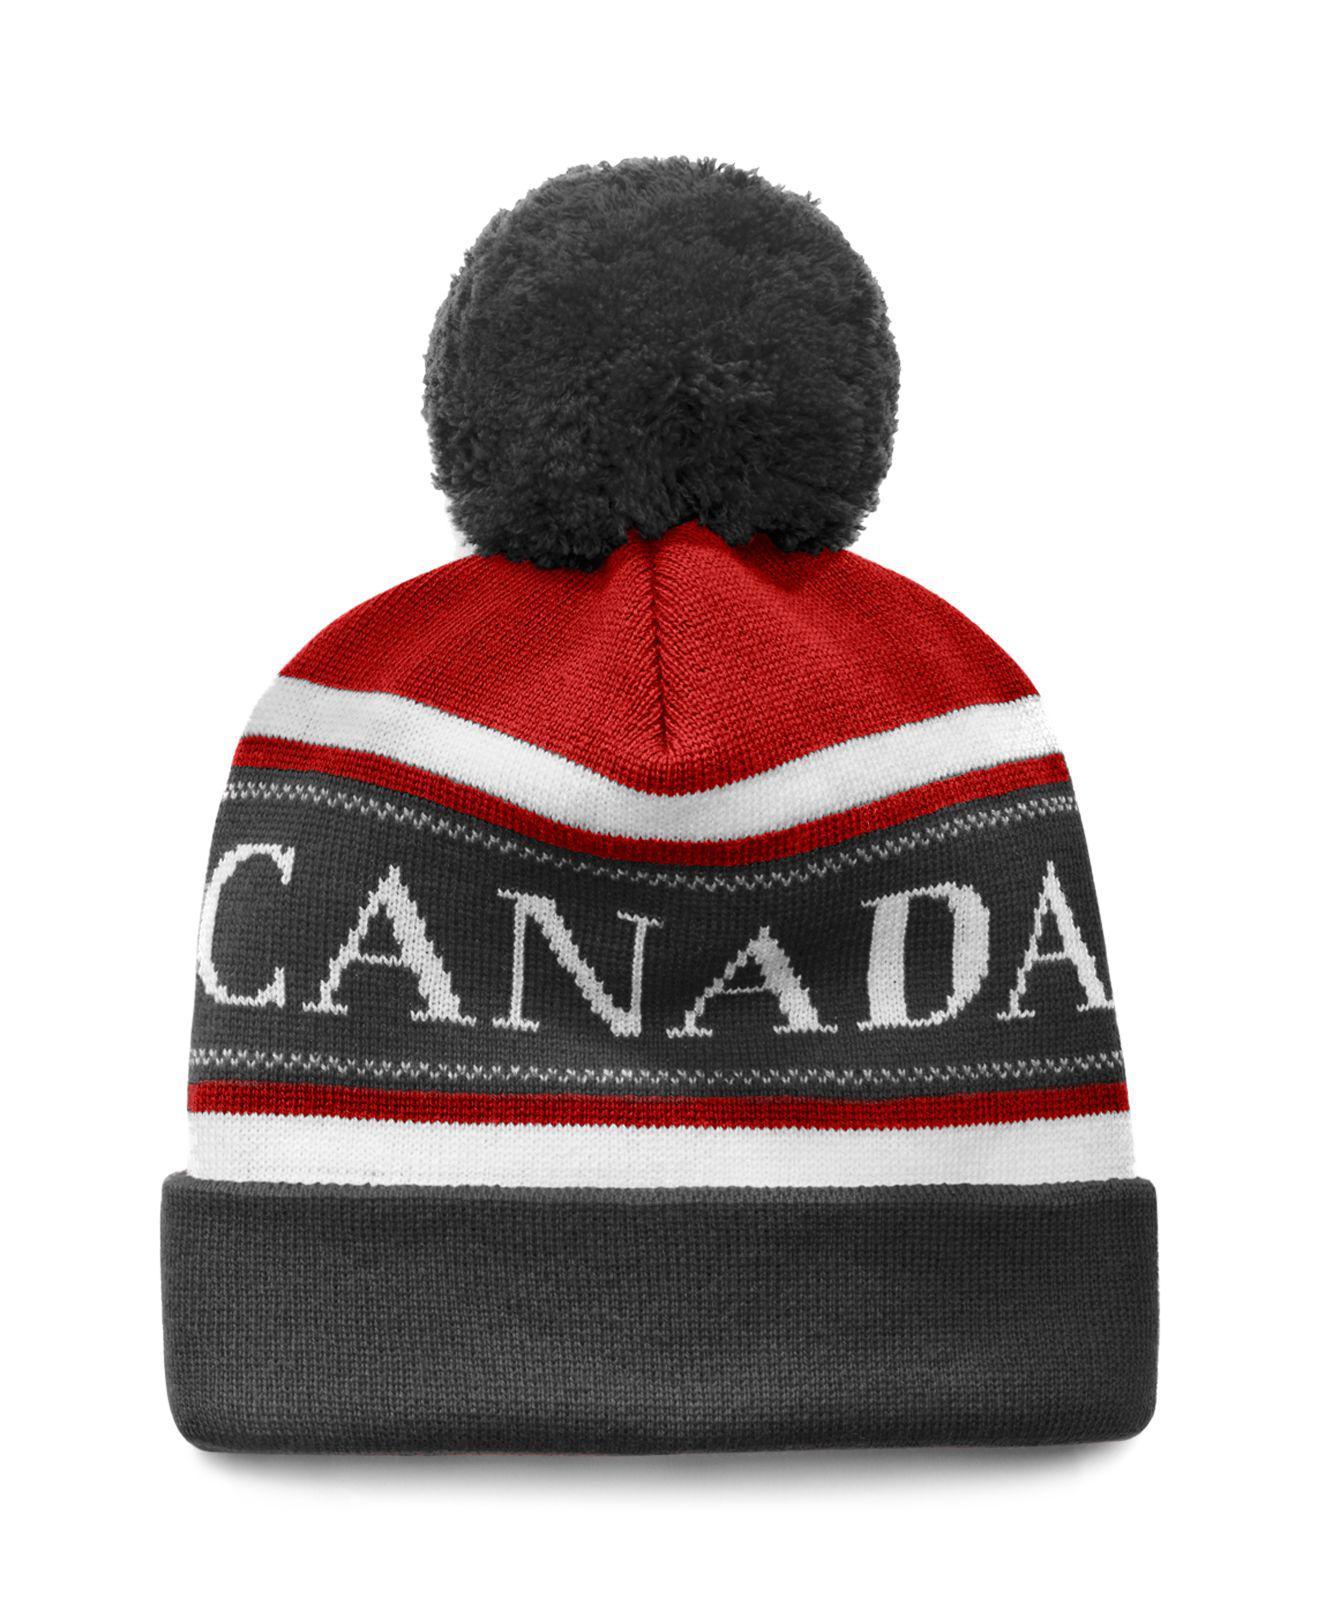 c70dc515 Lyst - Canada Goose Merino Logo Pom Hat in Red for Men